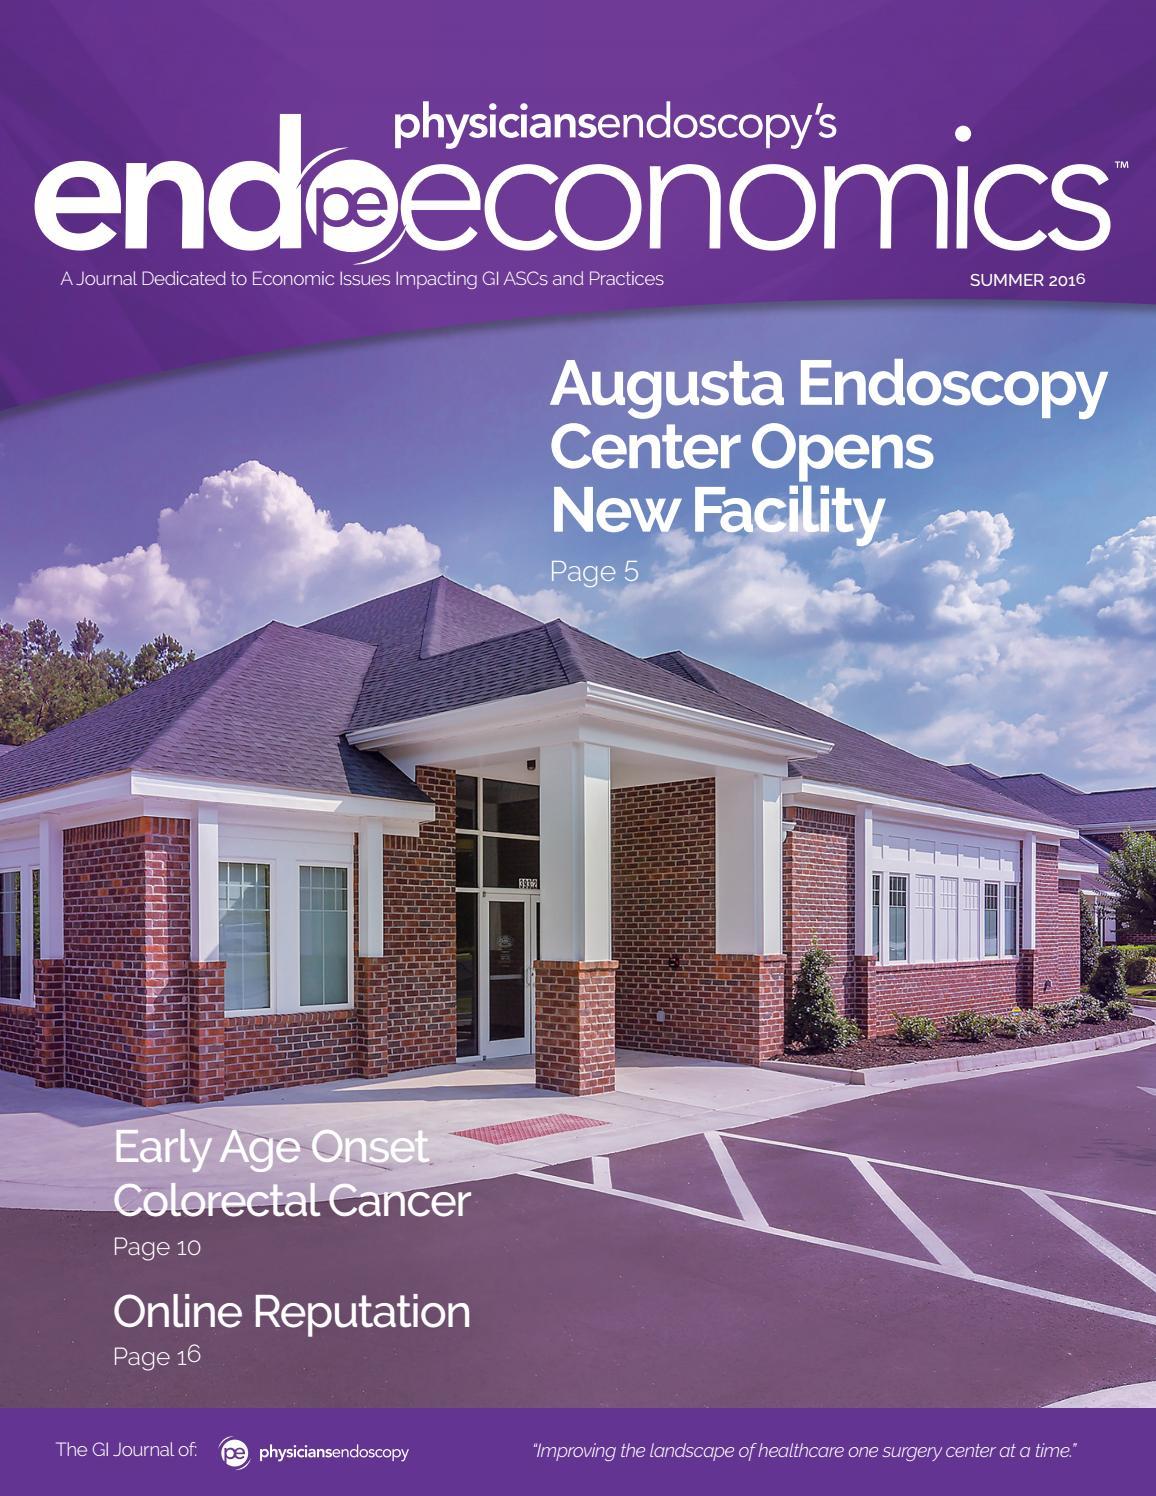 Endoscopy Suite: EndoEconomics Summer 2016 By Physicians Endoscopy, LLC